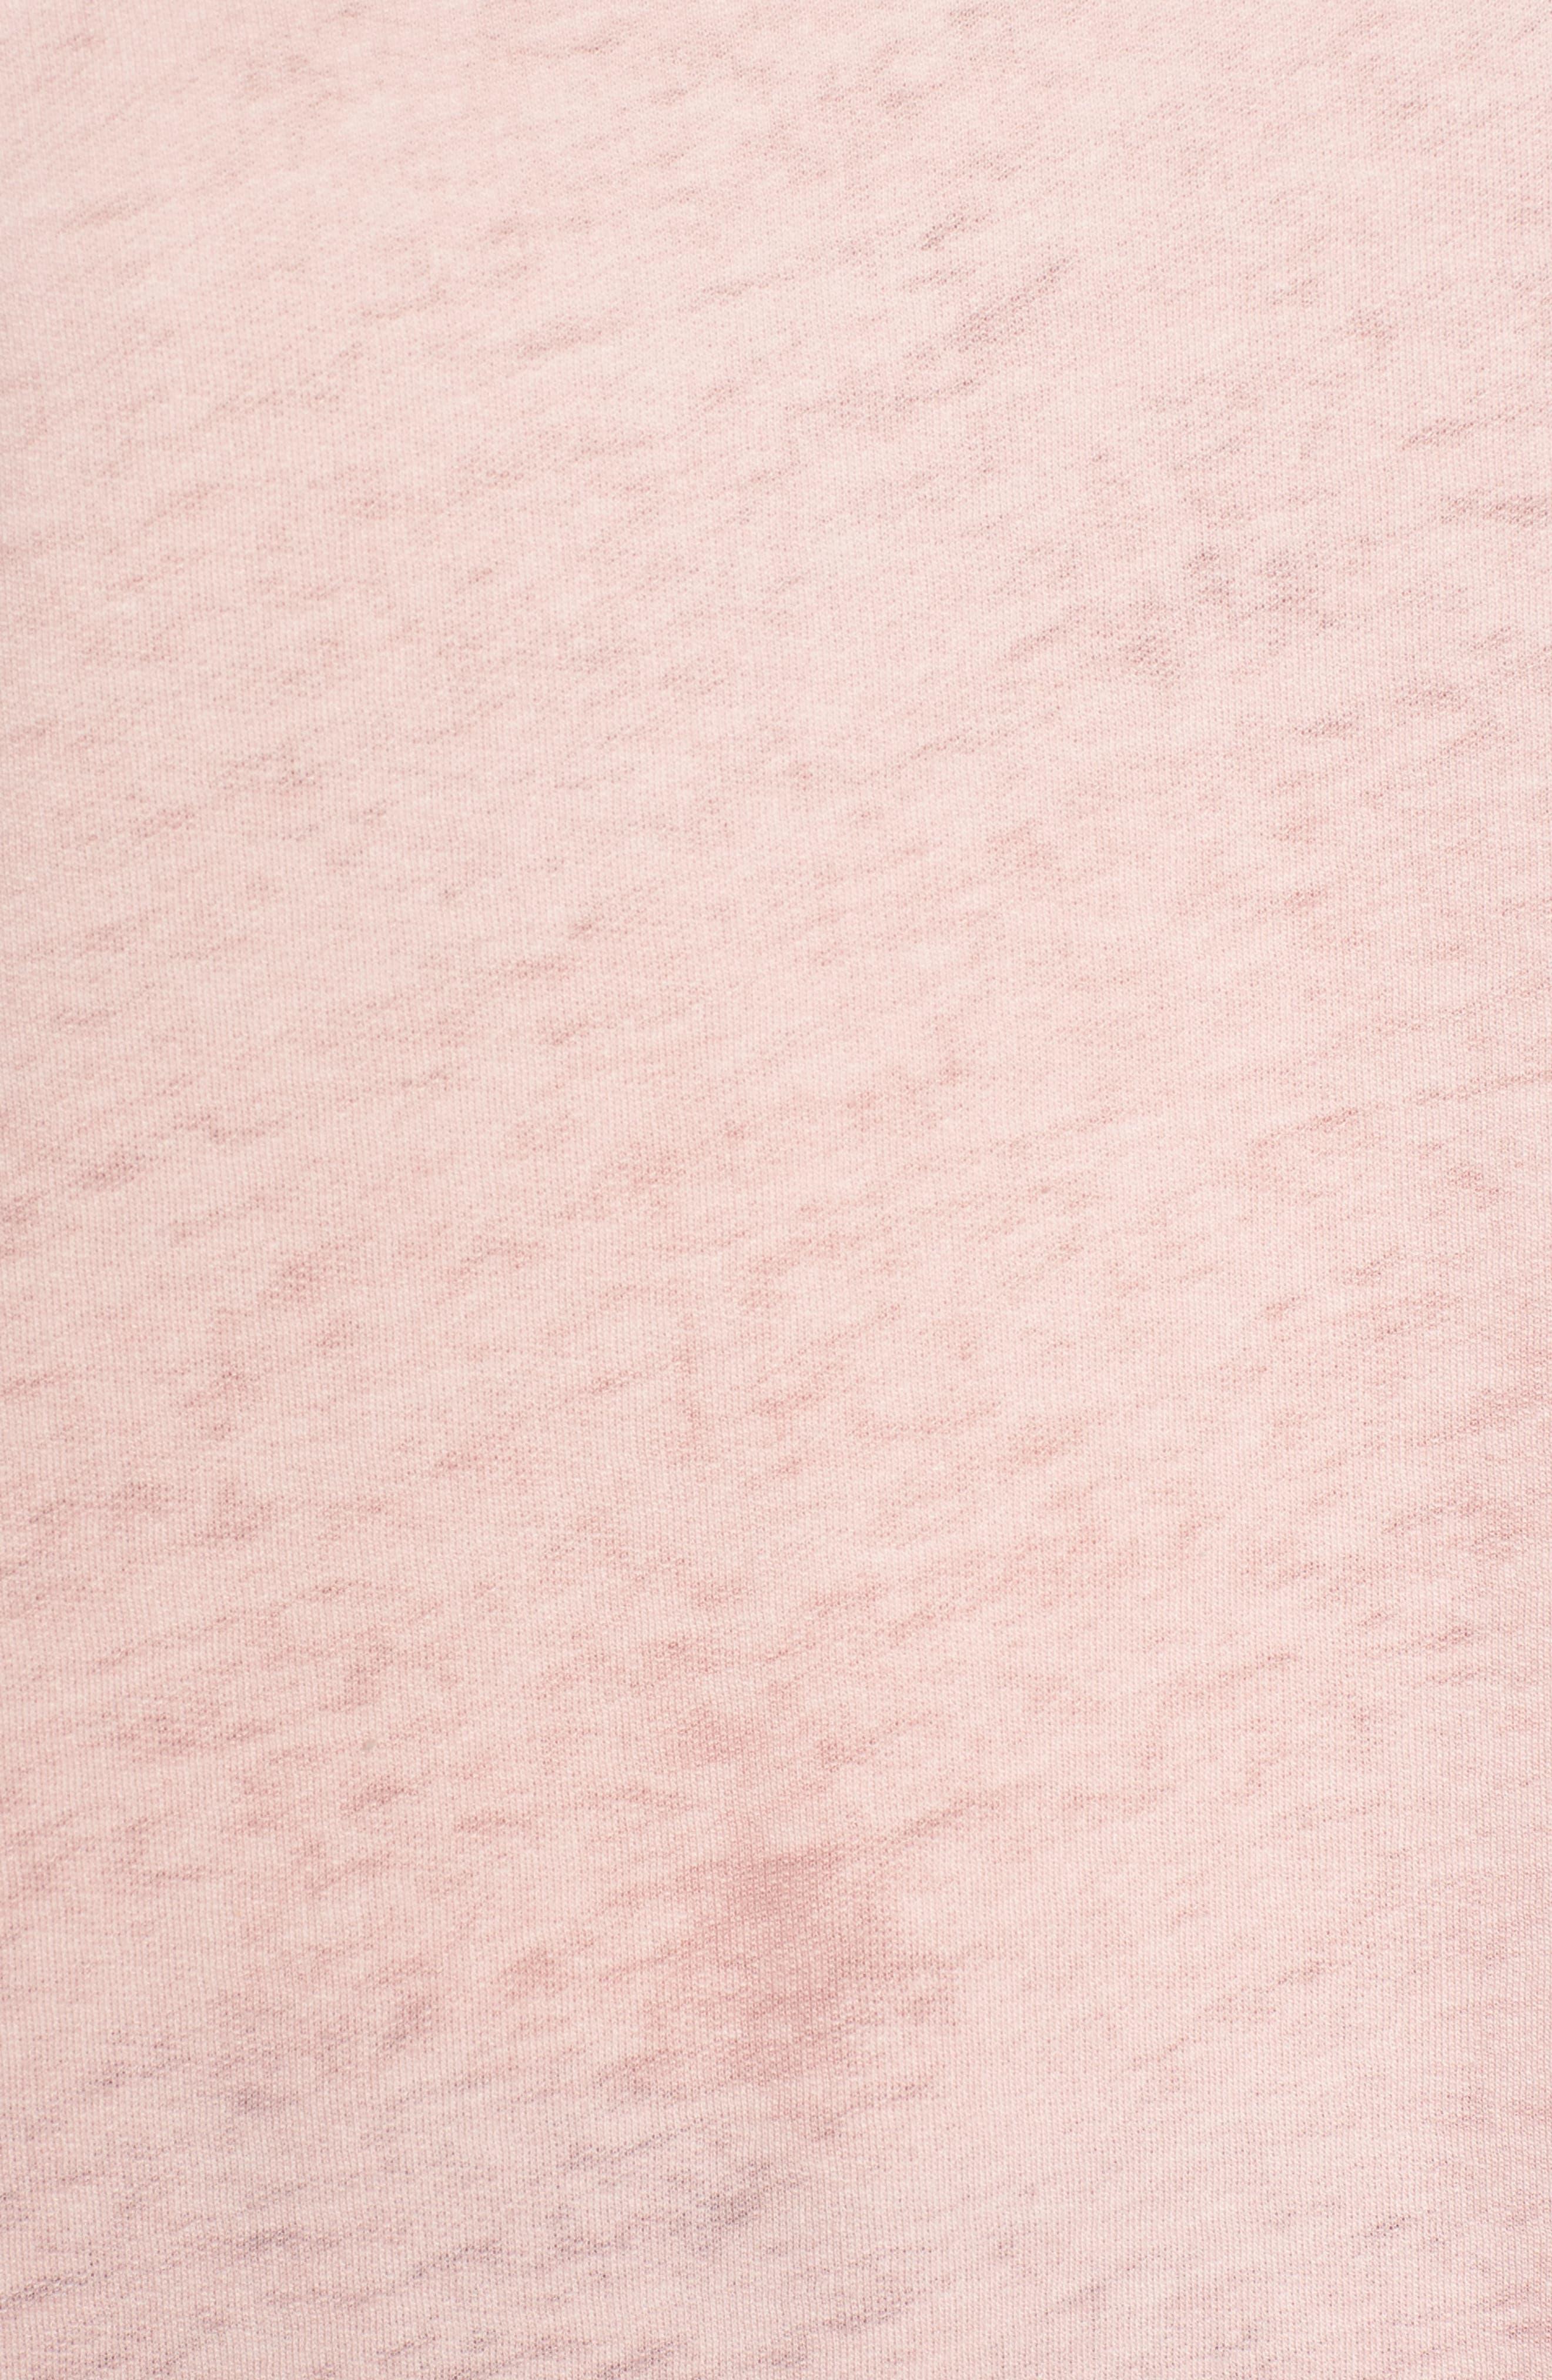 Bell Sleeve Sweatshirt,                             Alternate thumbnail 6, color,                             Pink Silver